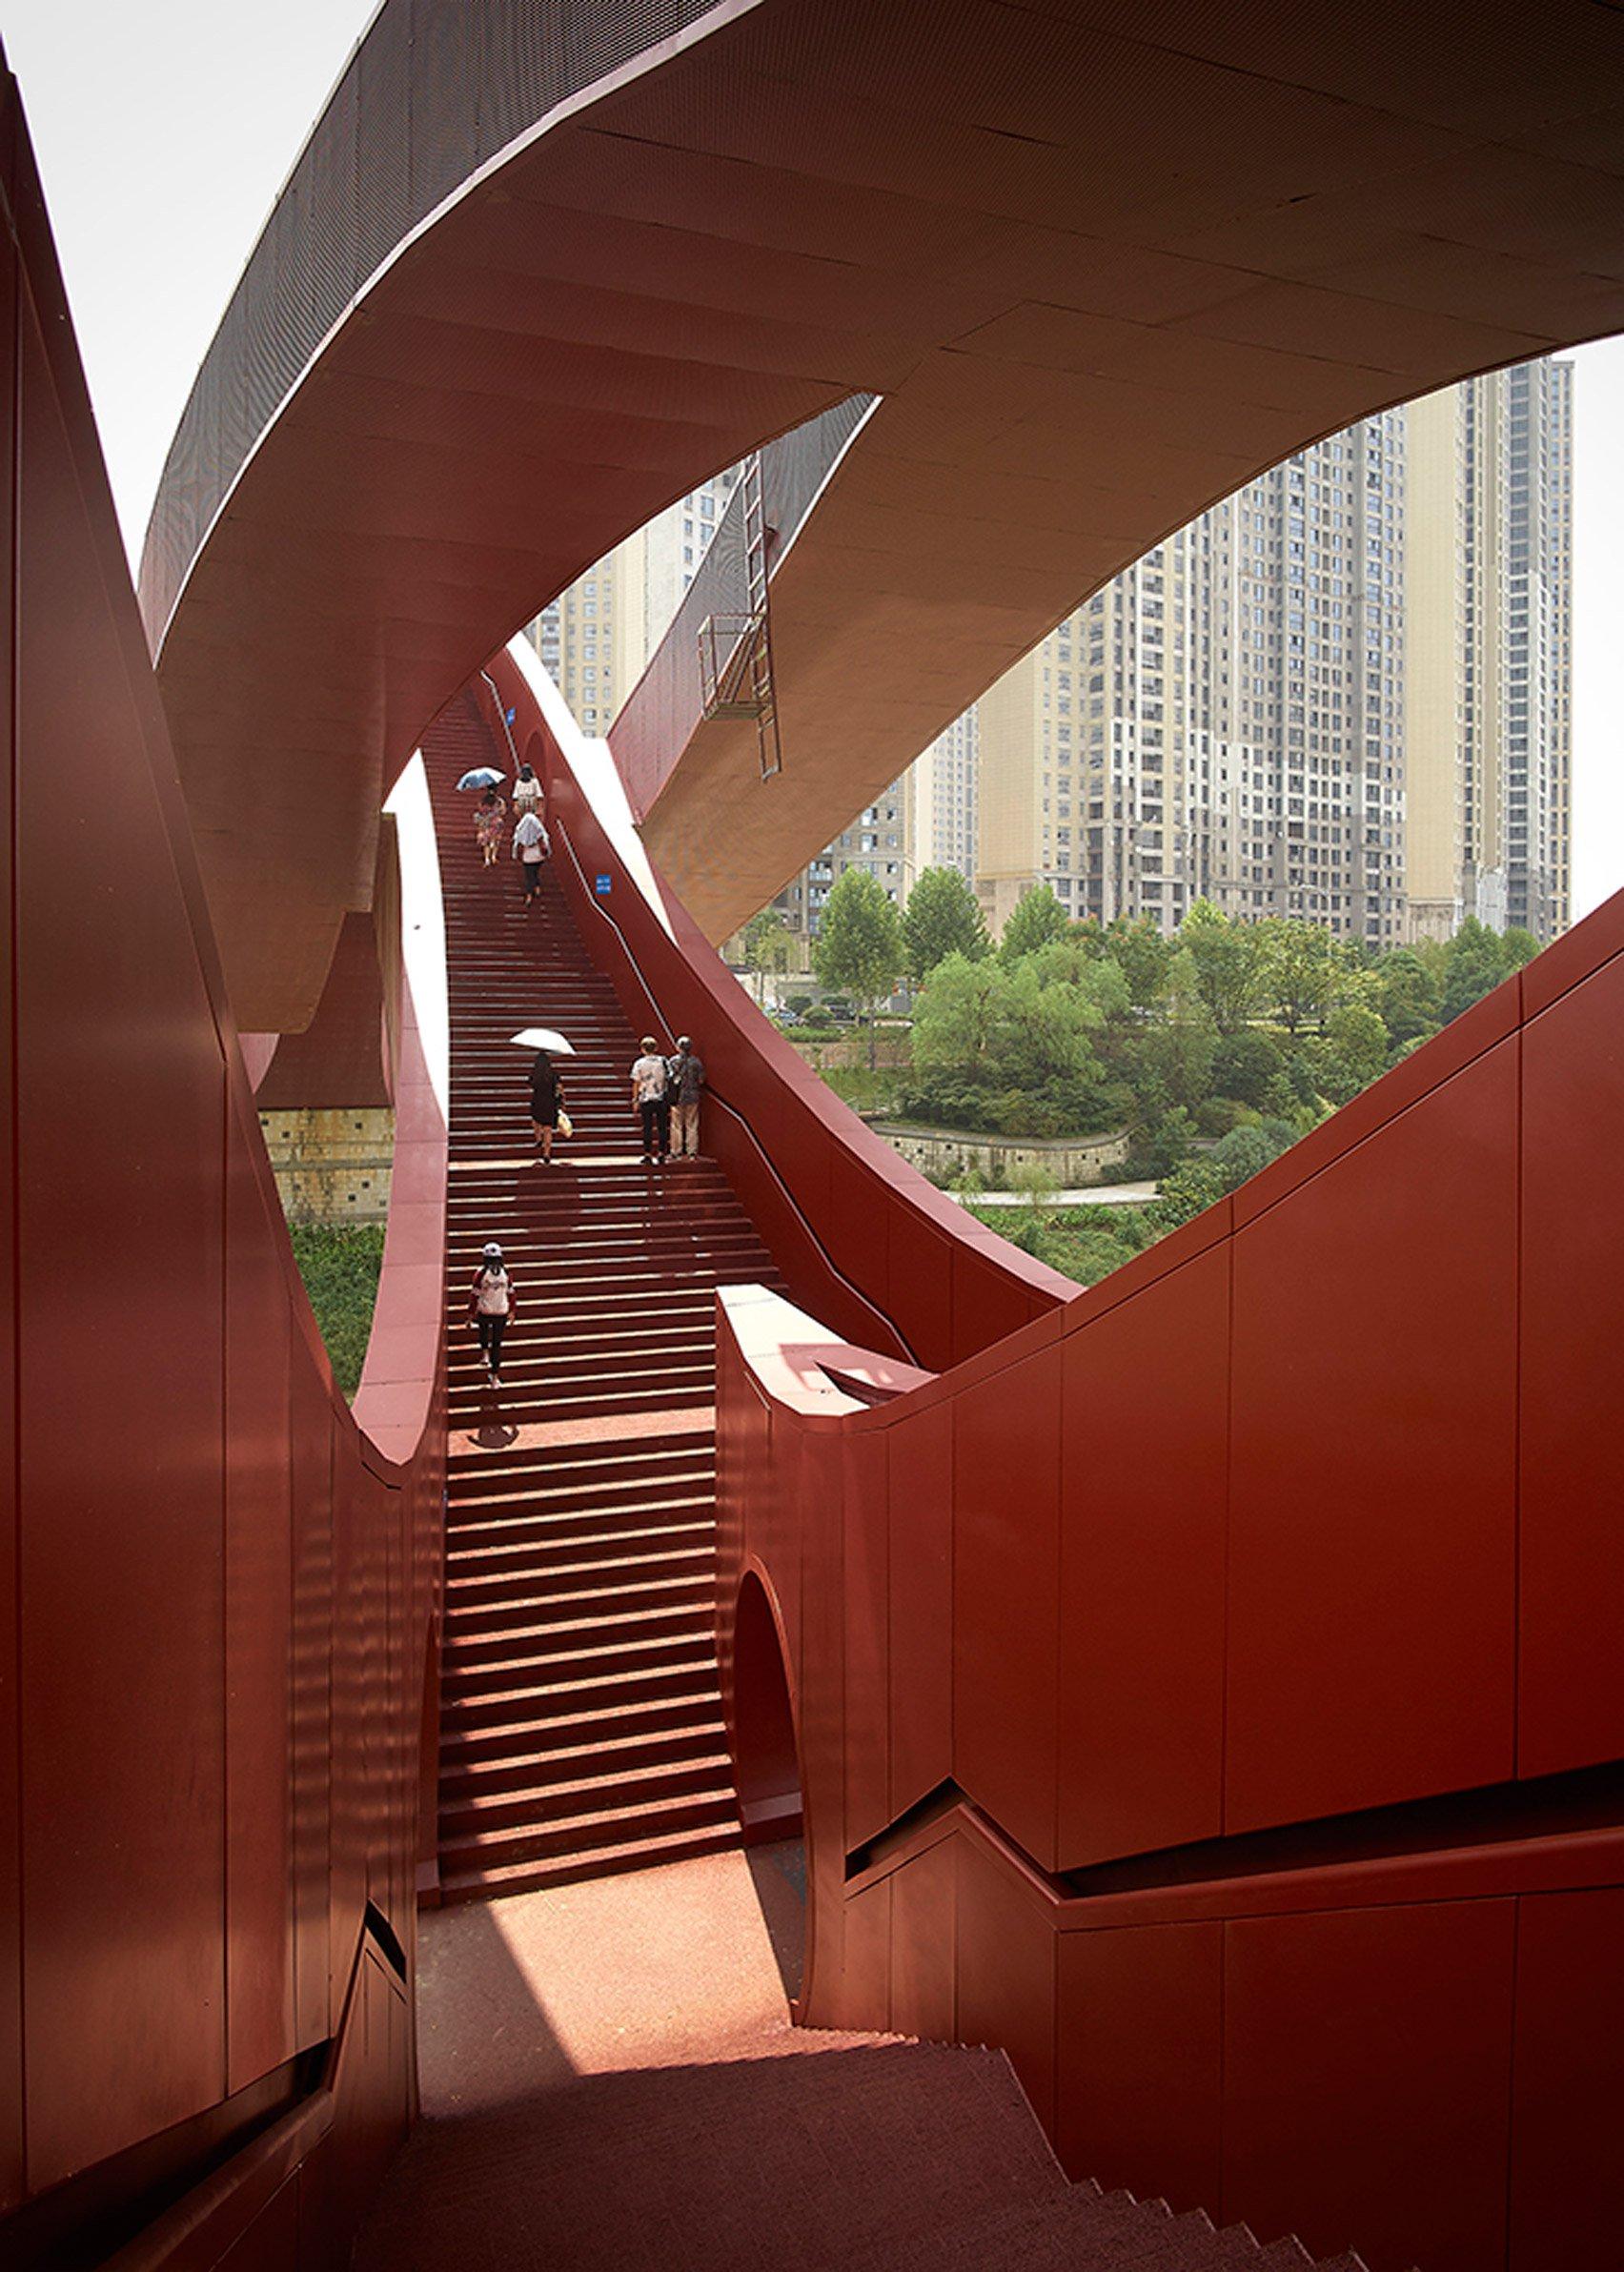 lucky-knot-pedestrian-bridge-infrastructure-design-architecture-next-architects-meixi-lake-china_dezeen_1704_col_1-1